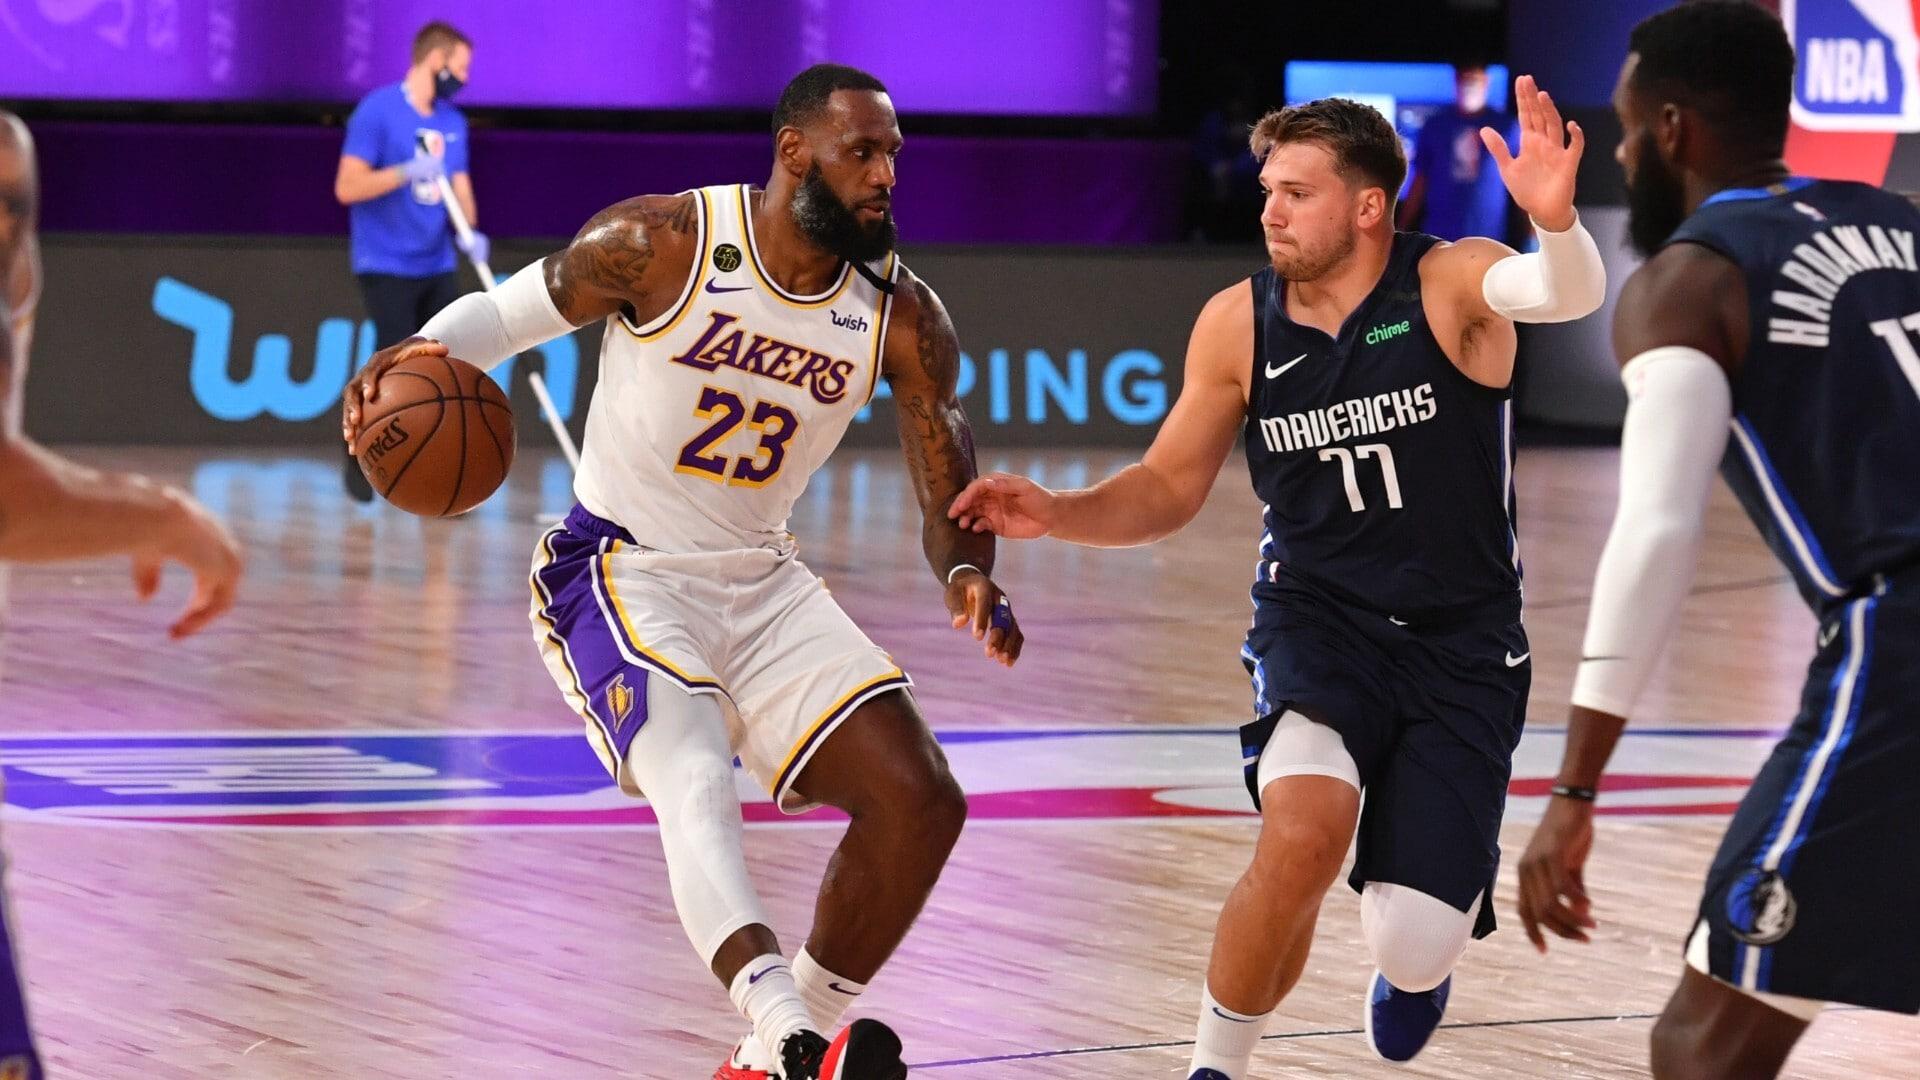 Mavericks @ Lakers